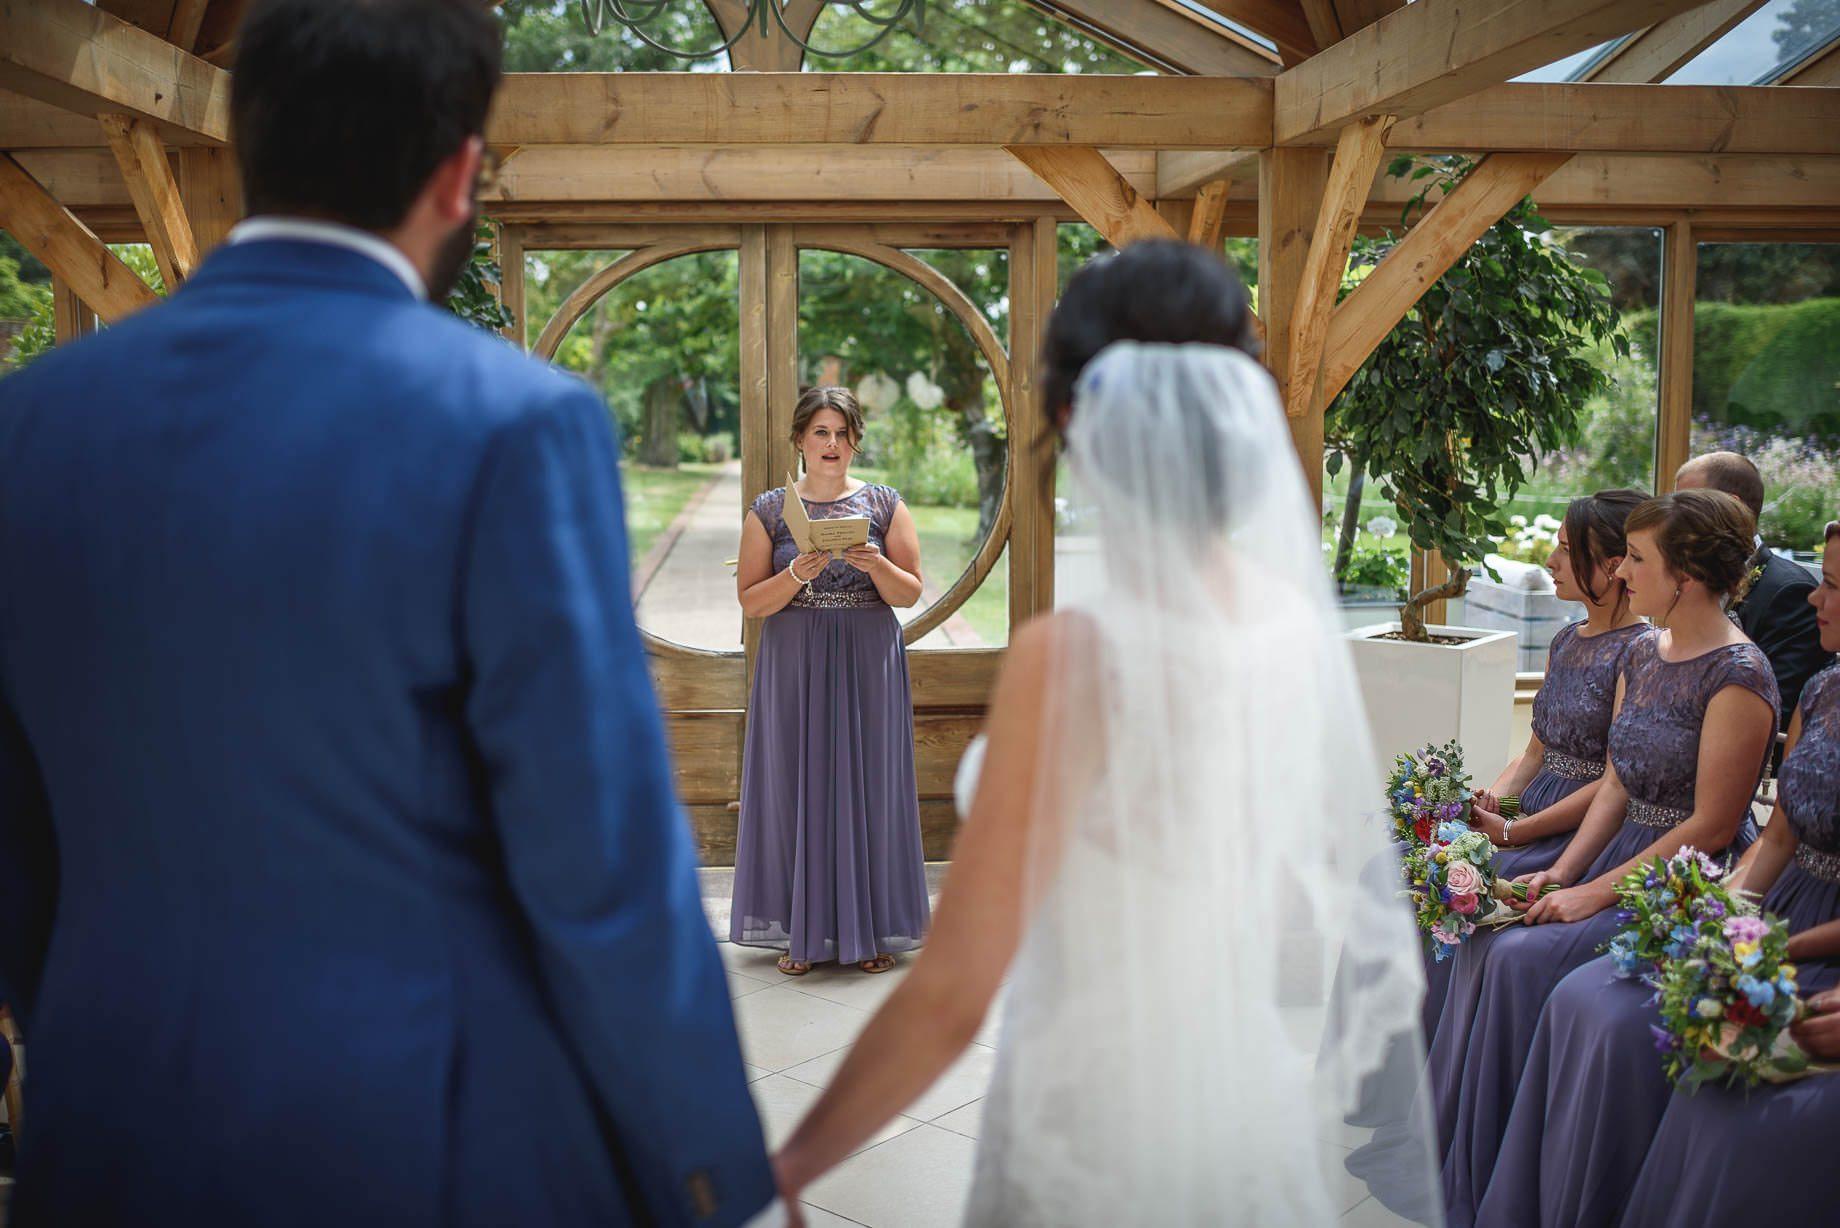 Gaynes Park wedding photography - Guy Collier Photography - Rachel and Jon (70 of 169)